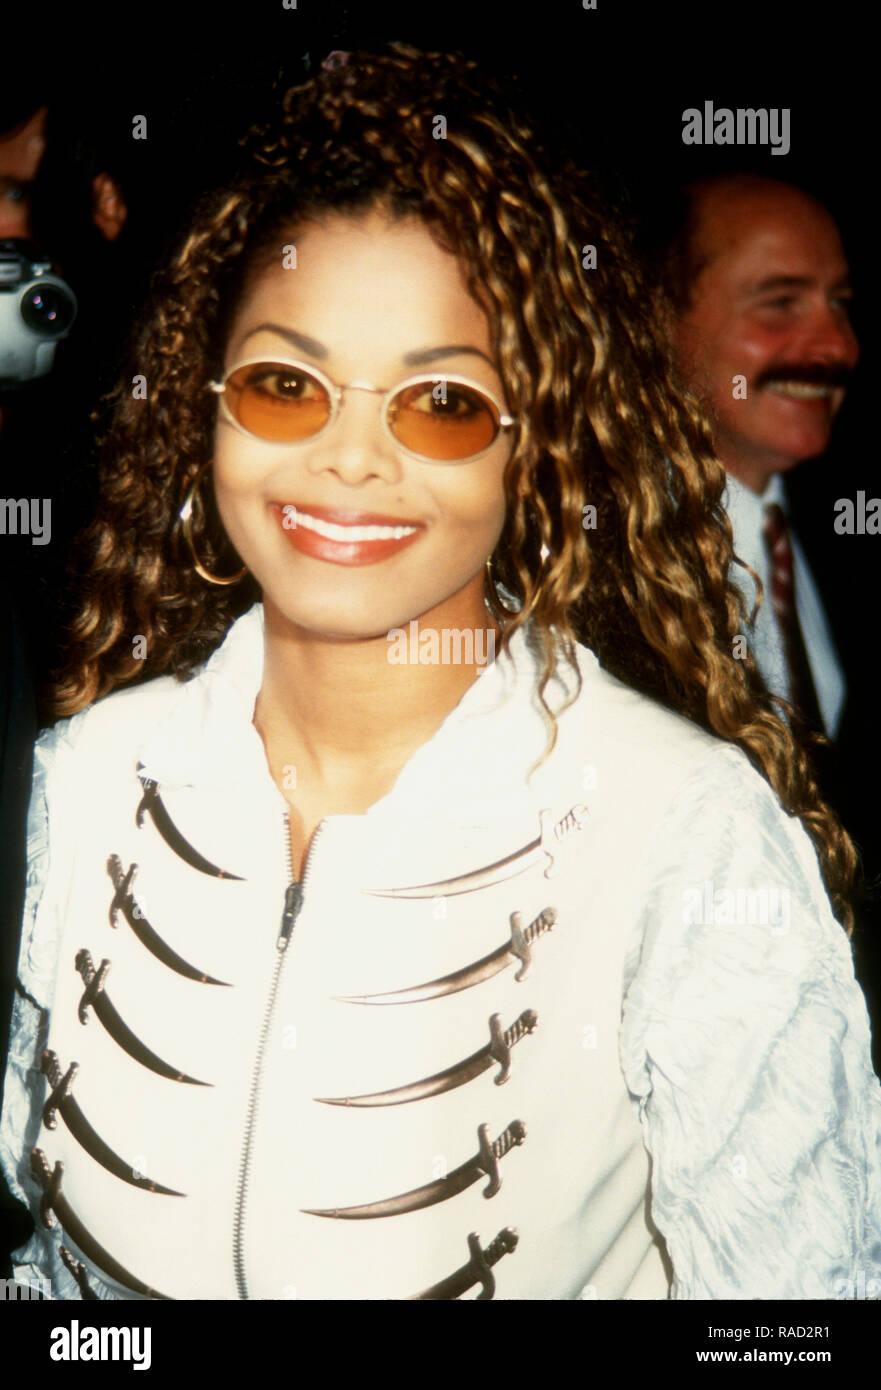 BEVERLY HILLS, CA - JULY 21: Singer Janet Jackson attends